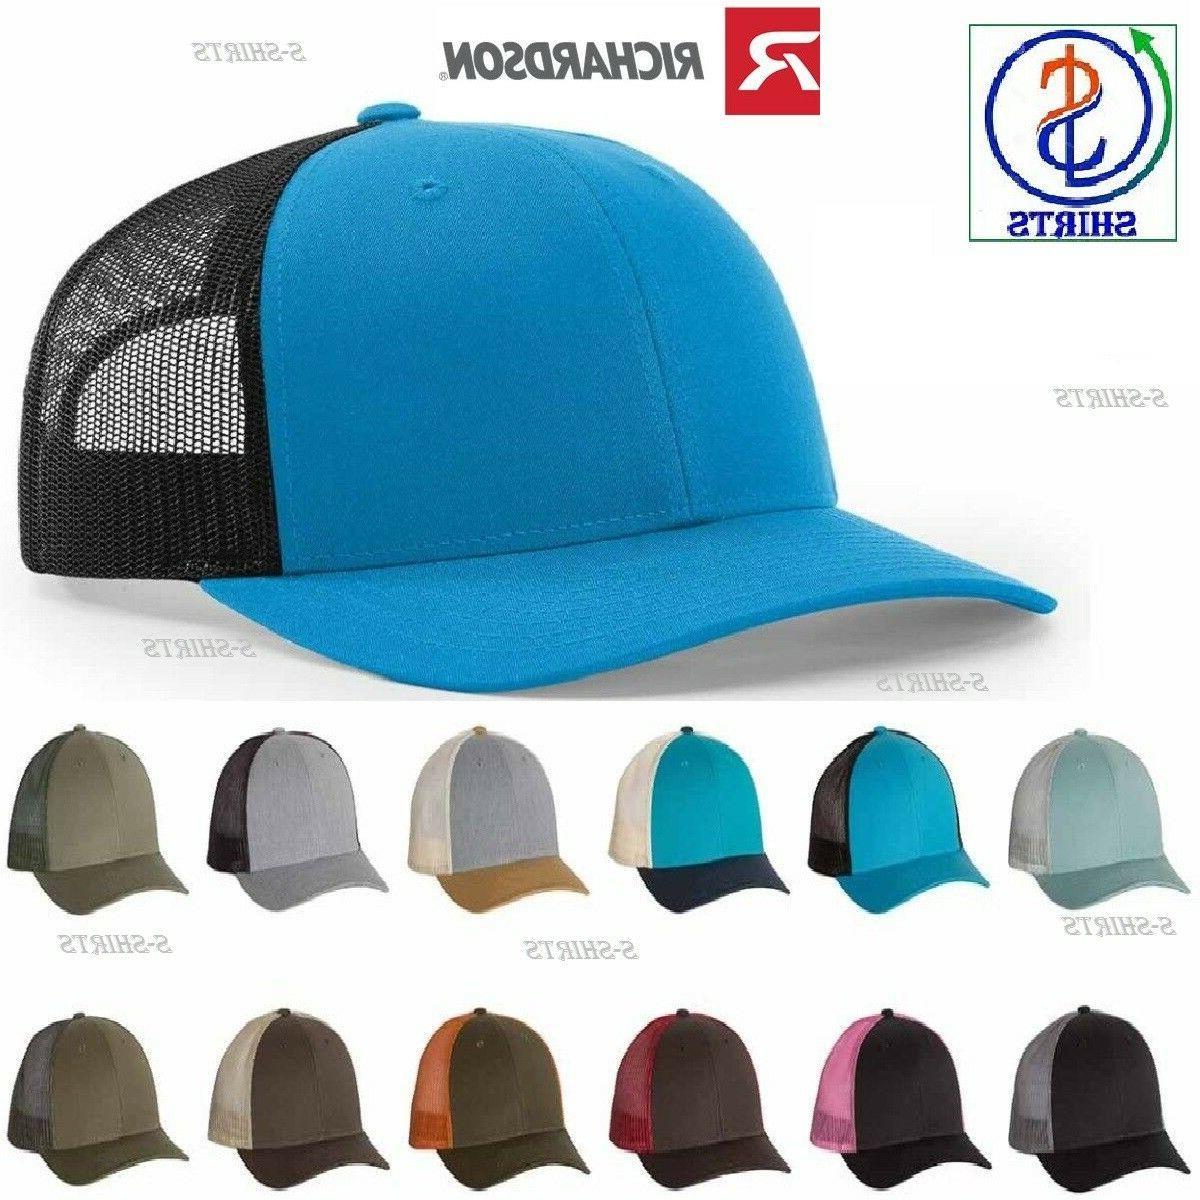 Richardson Low Profile Trucker Caps Men's Hats 115 adjustabl